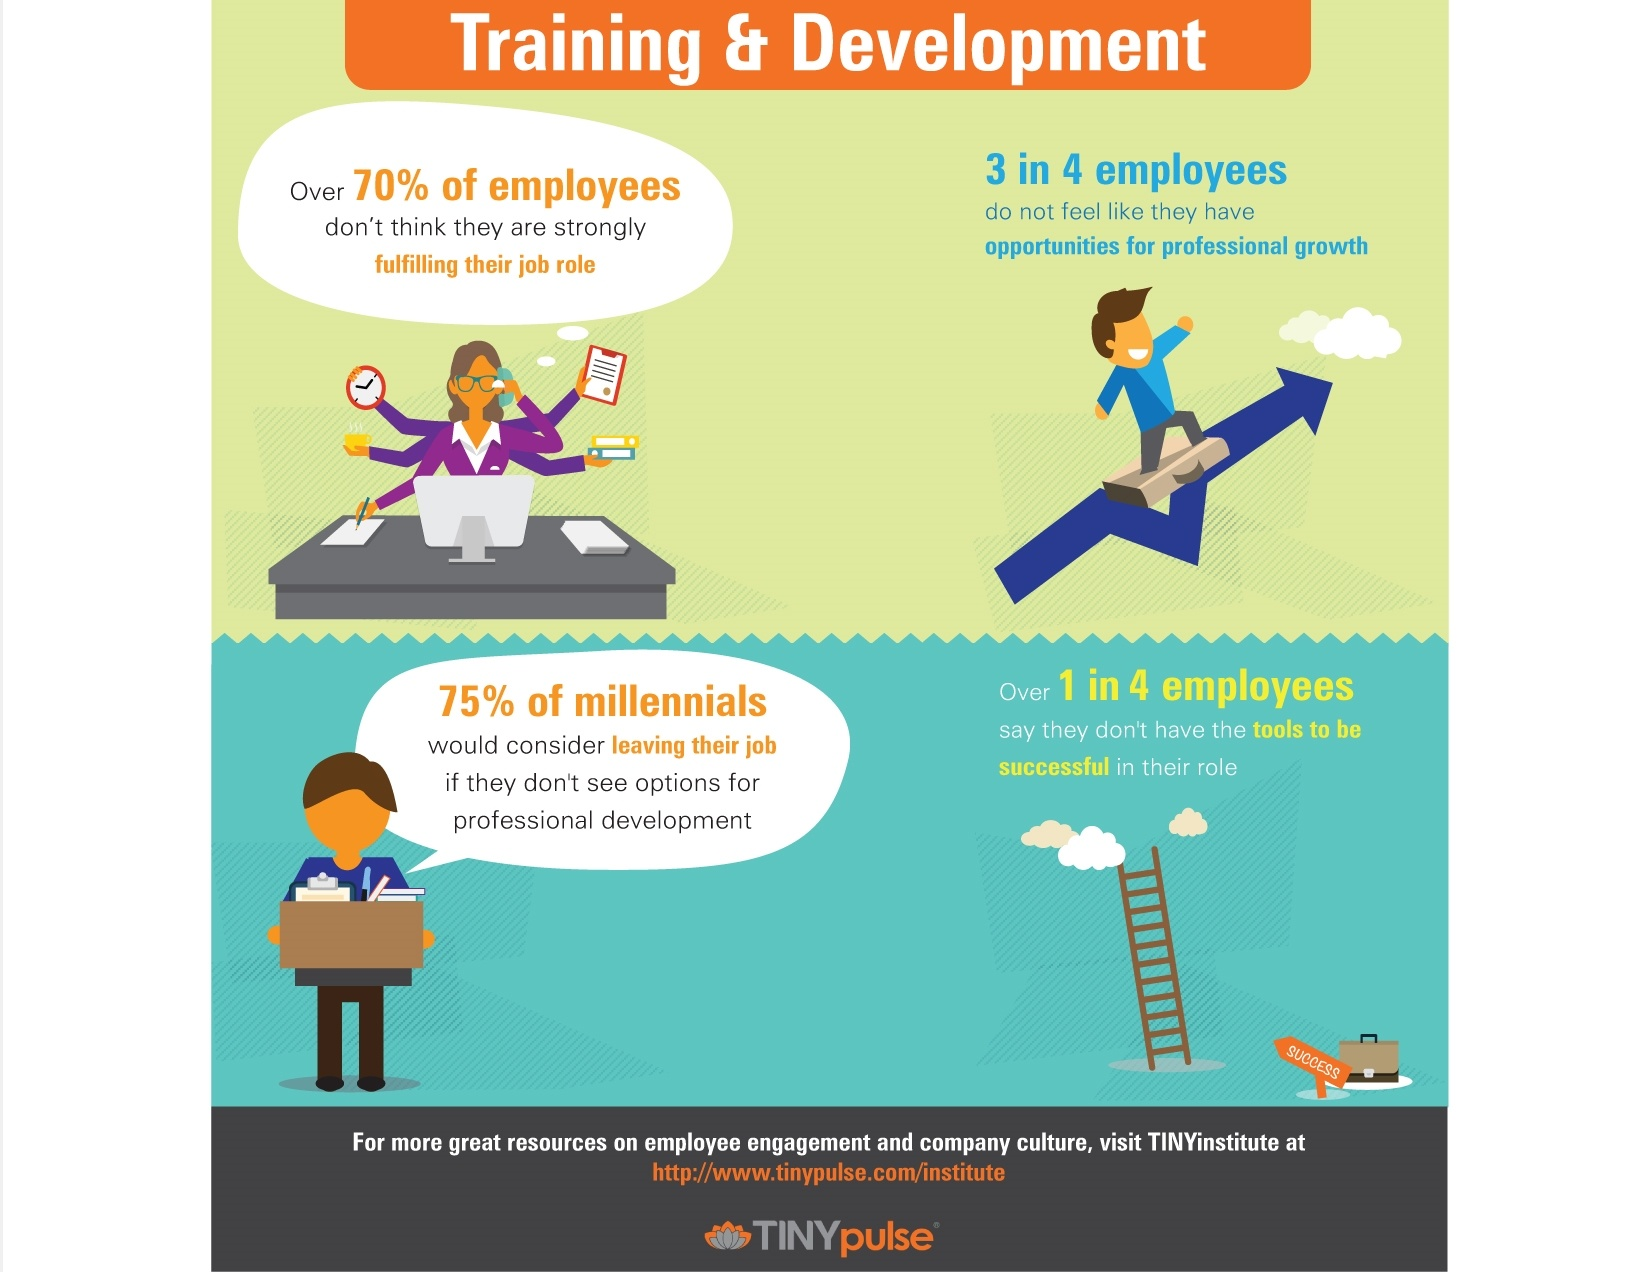 TINYpulse Employee Training & Development Infographic